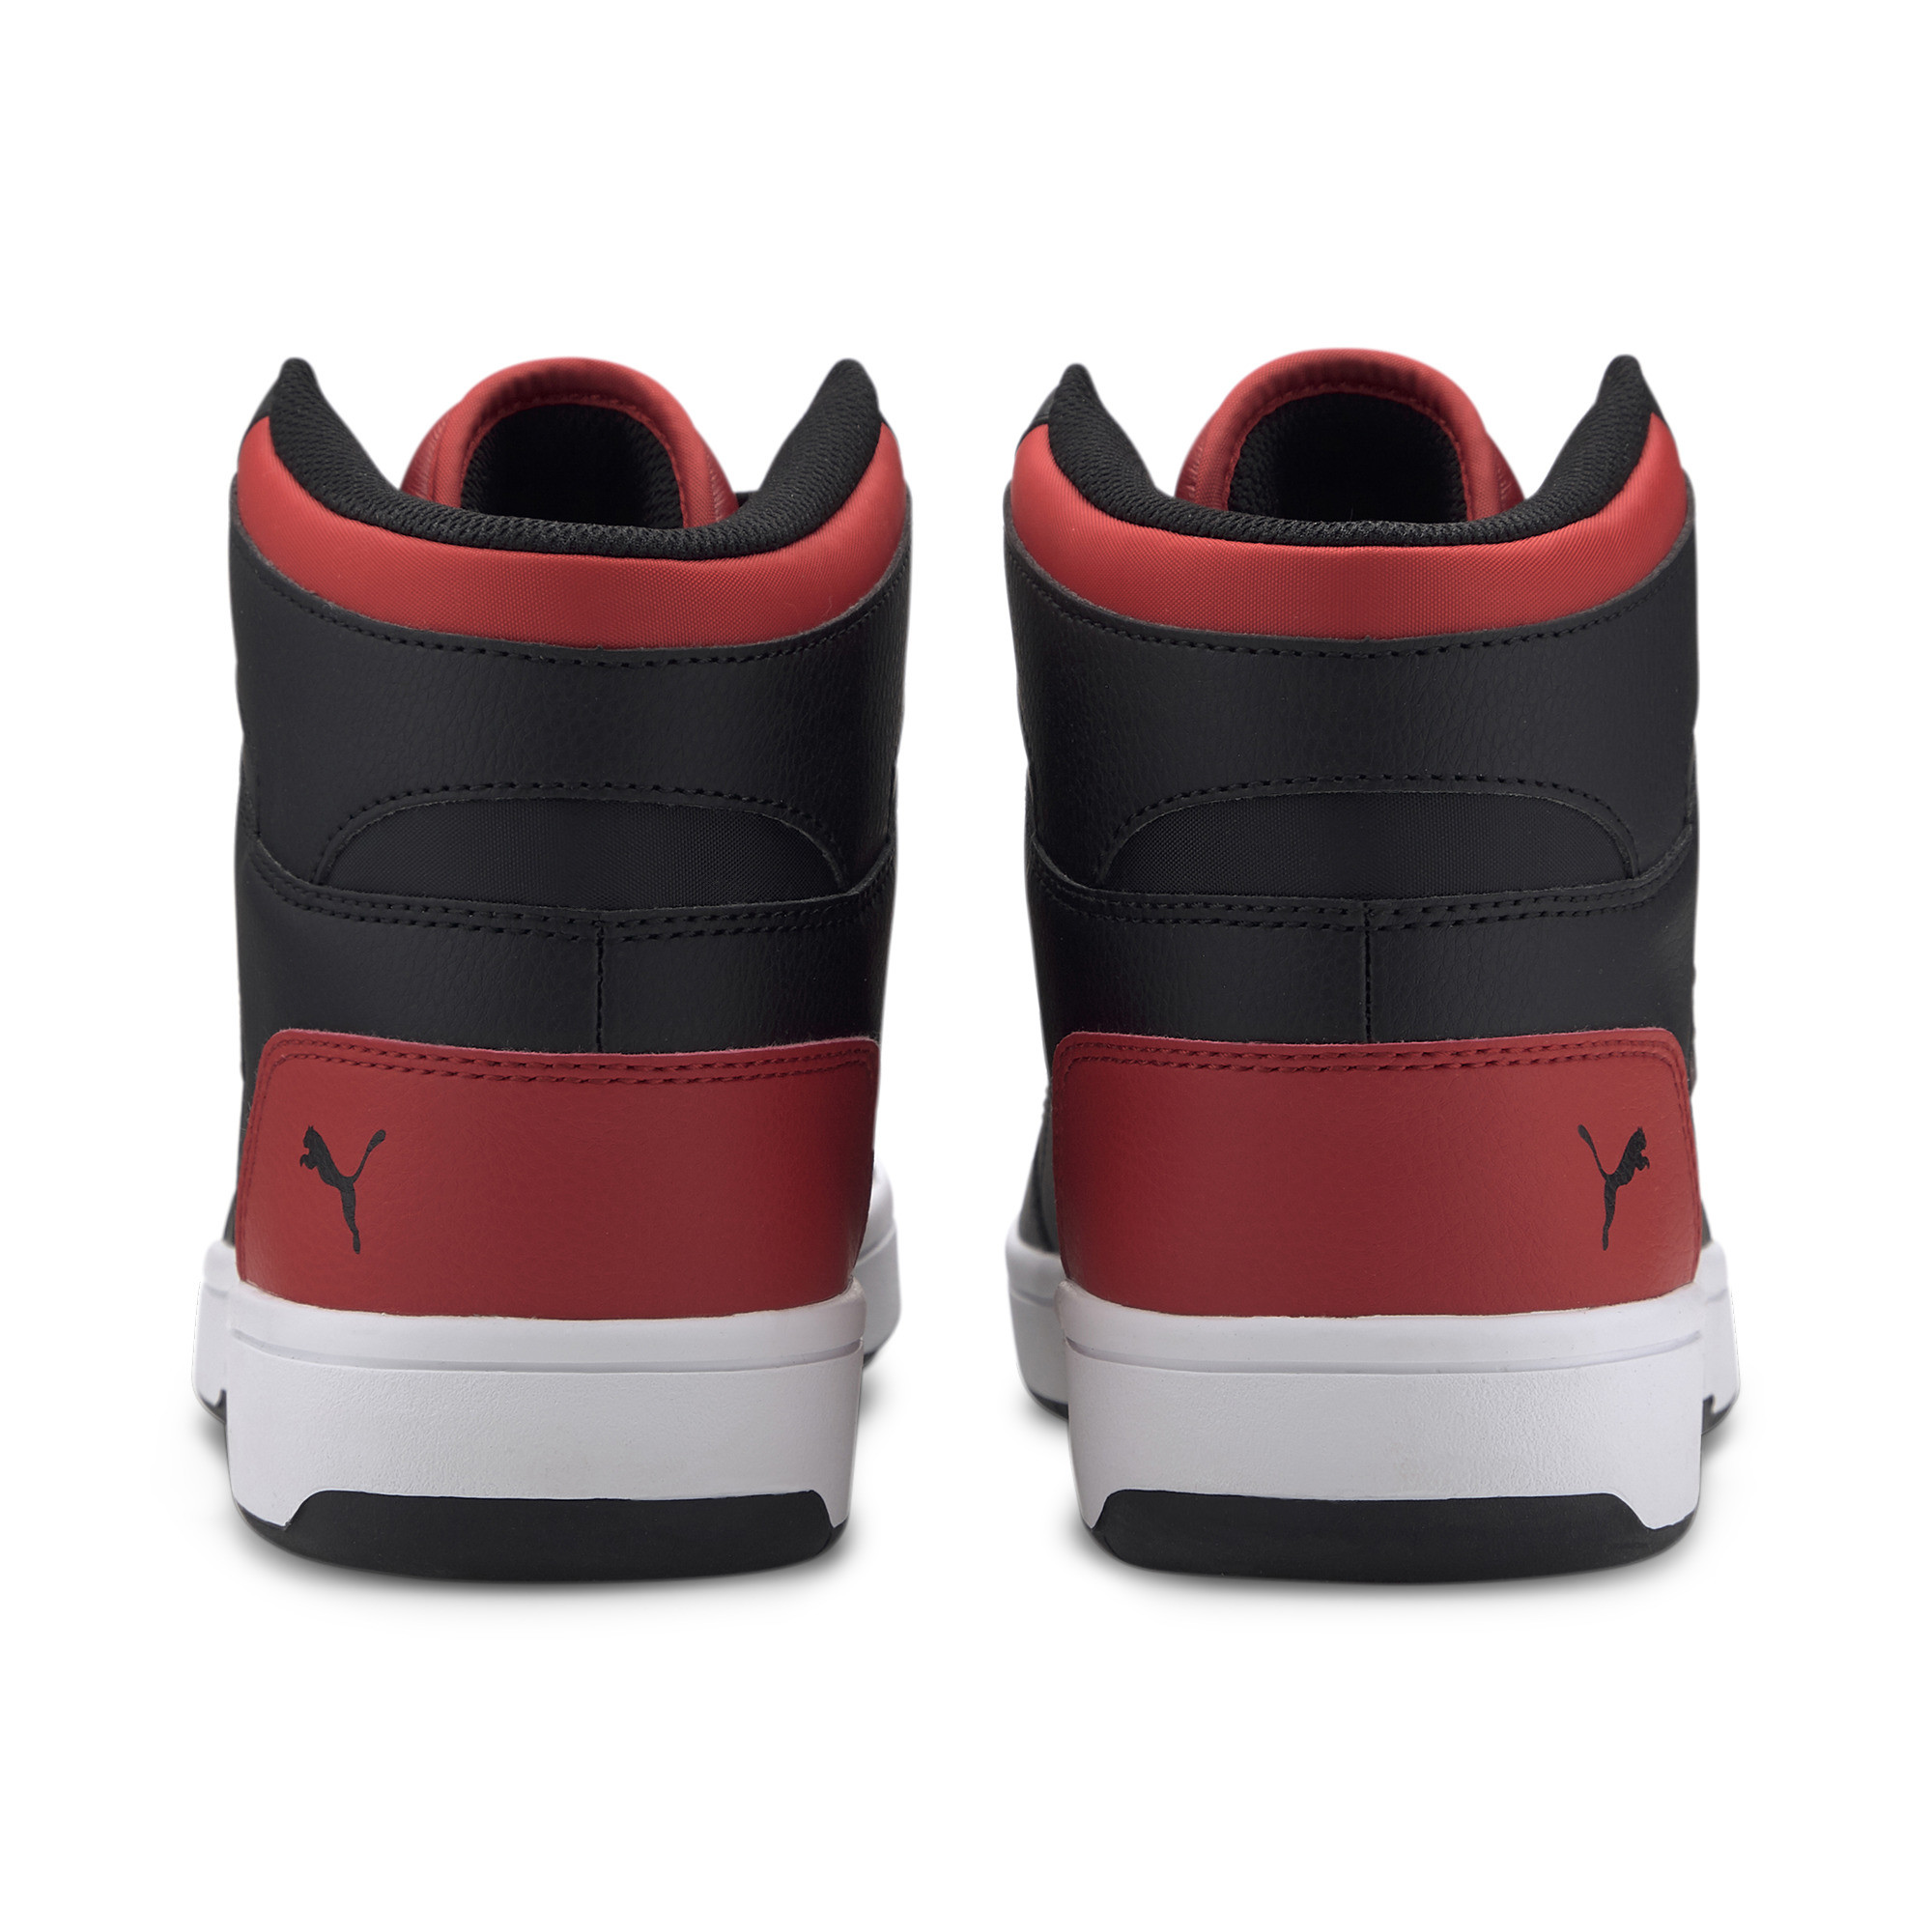 PUMA-PUMA-Rebound-LayUp-Men-039-s-Sneakers-Men-Mid-Boot-Basics thumbnail 21